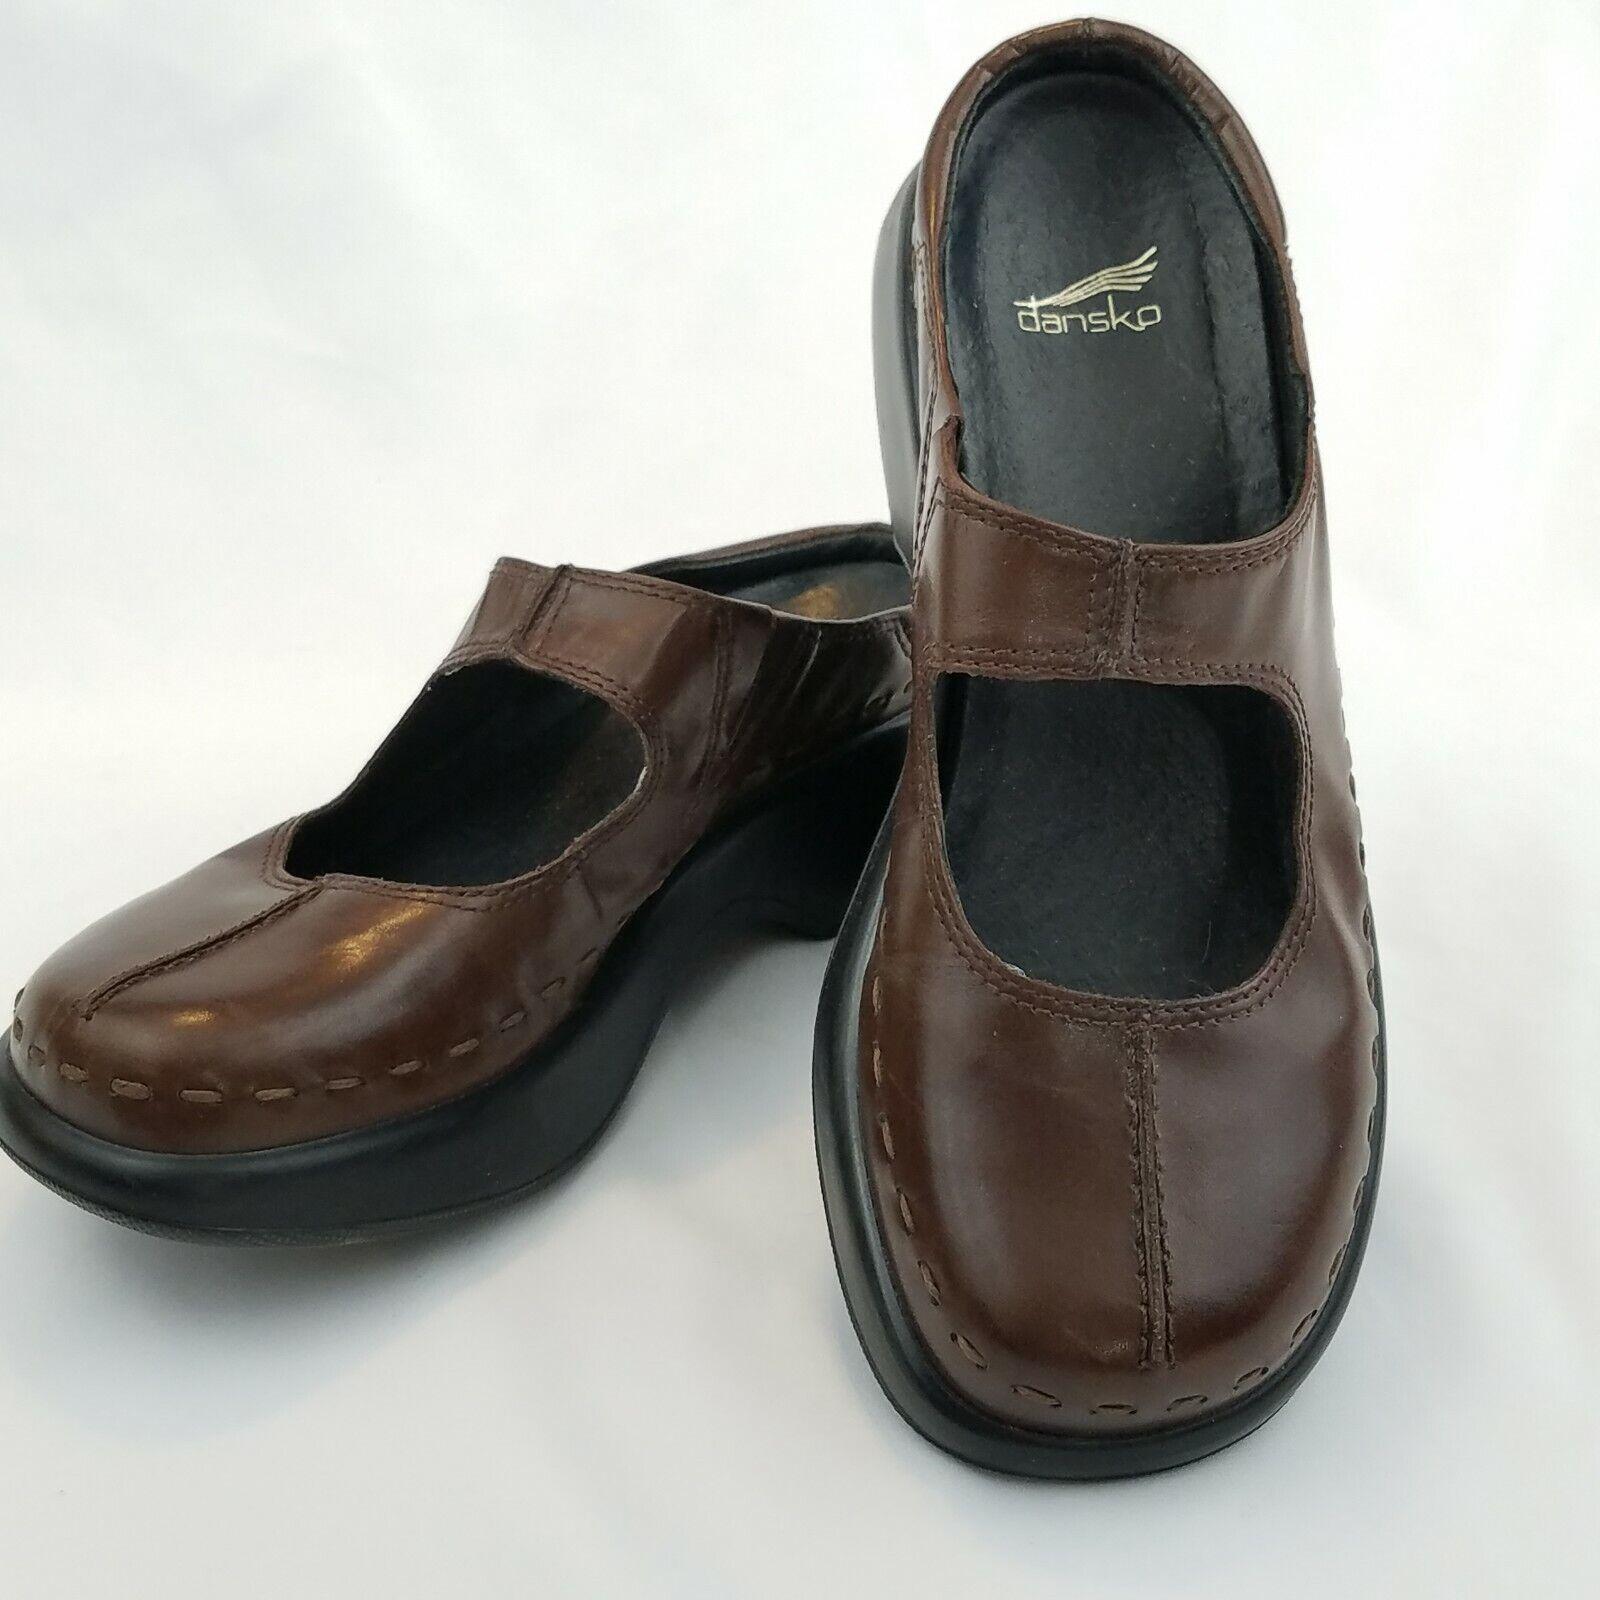 DANSKO Madori Mary Jane Mules Clogs Work Shoe US 7.5 EU 38 Brown Slip On